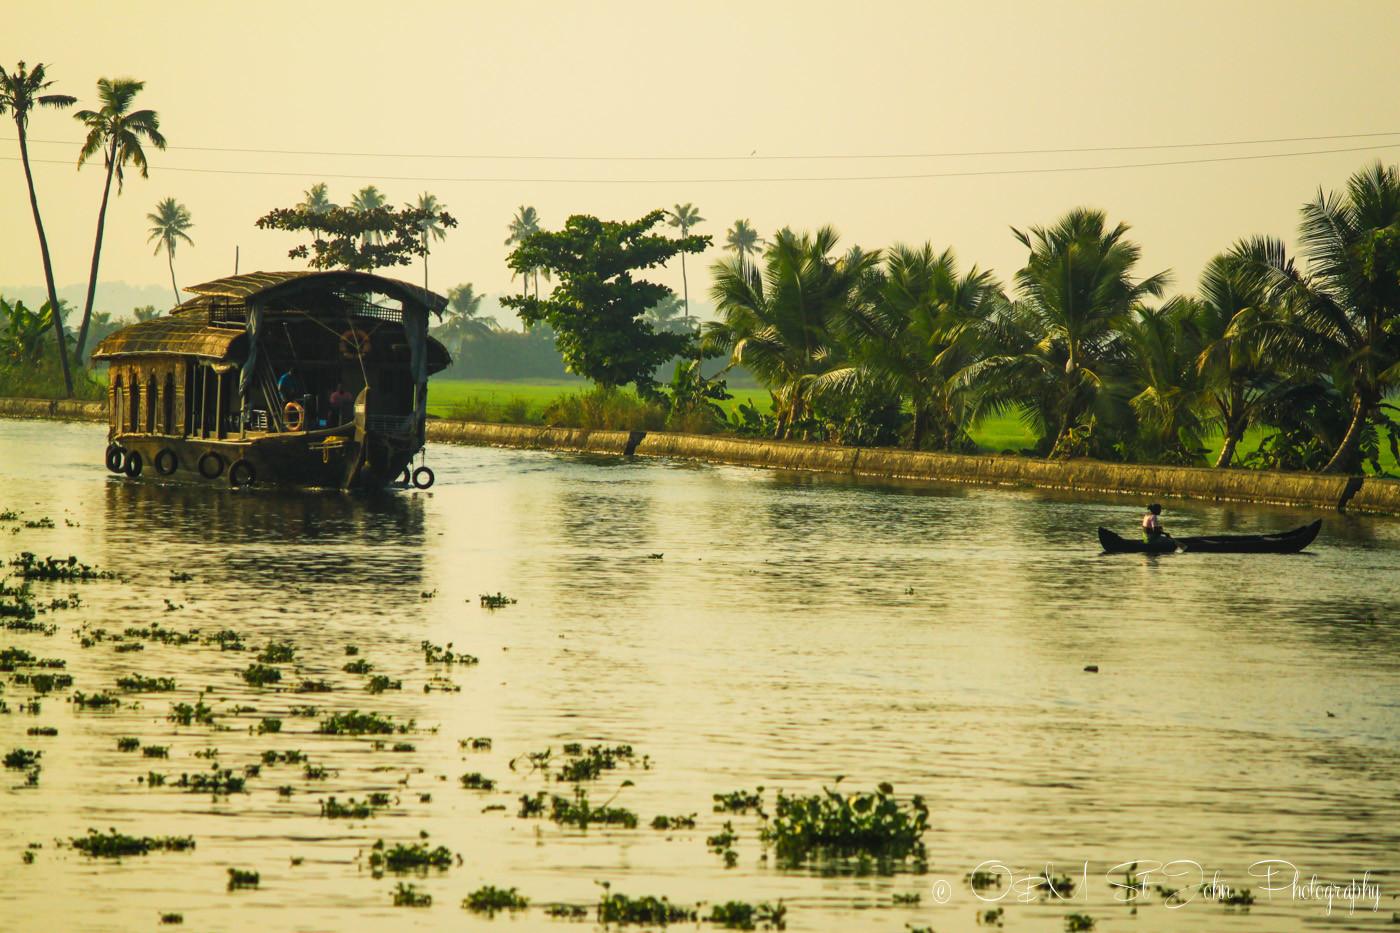 Kettuvallams (house boat) in Kerala Backwaters at sunset, India